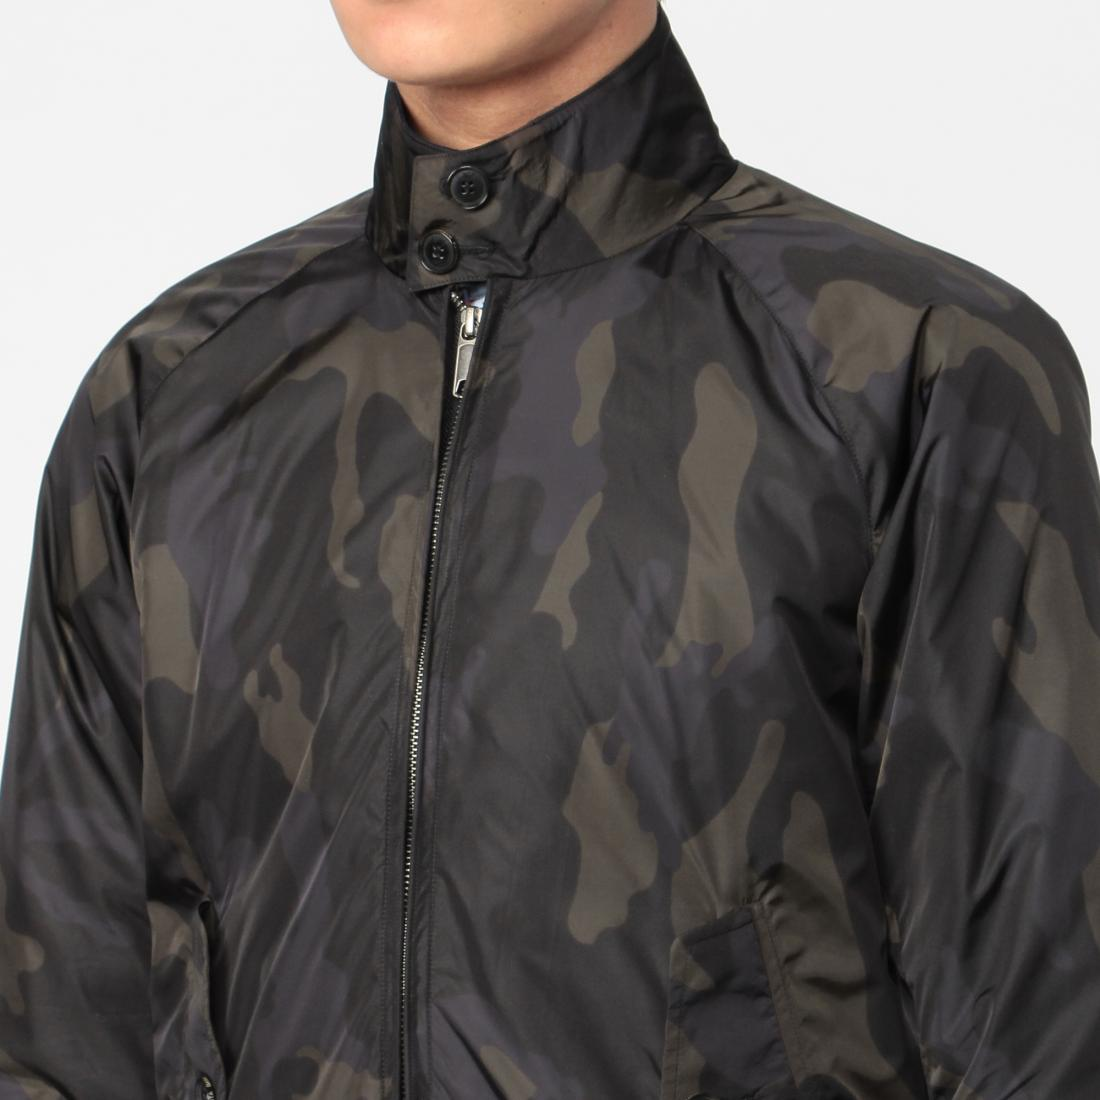 G9 Nylon 1185127: Camouflage